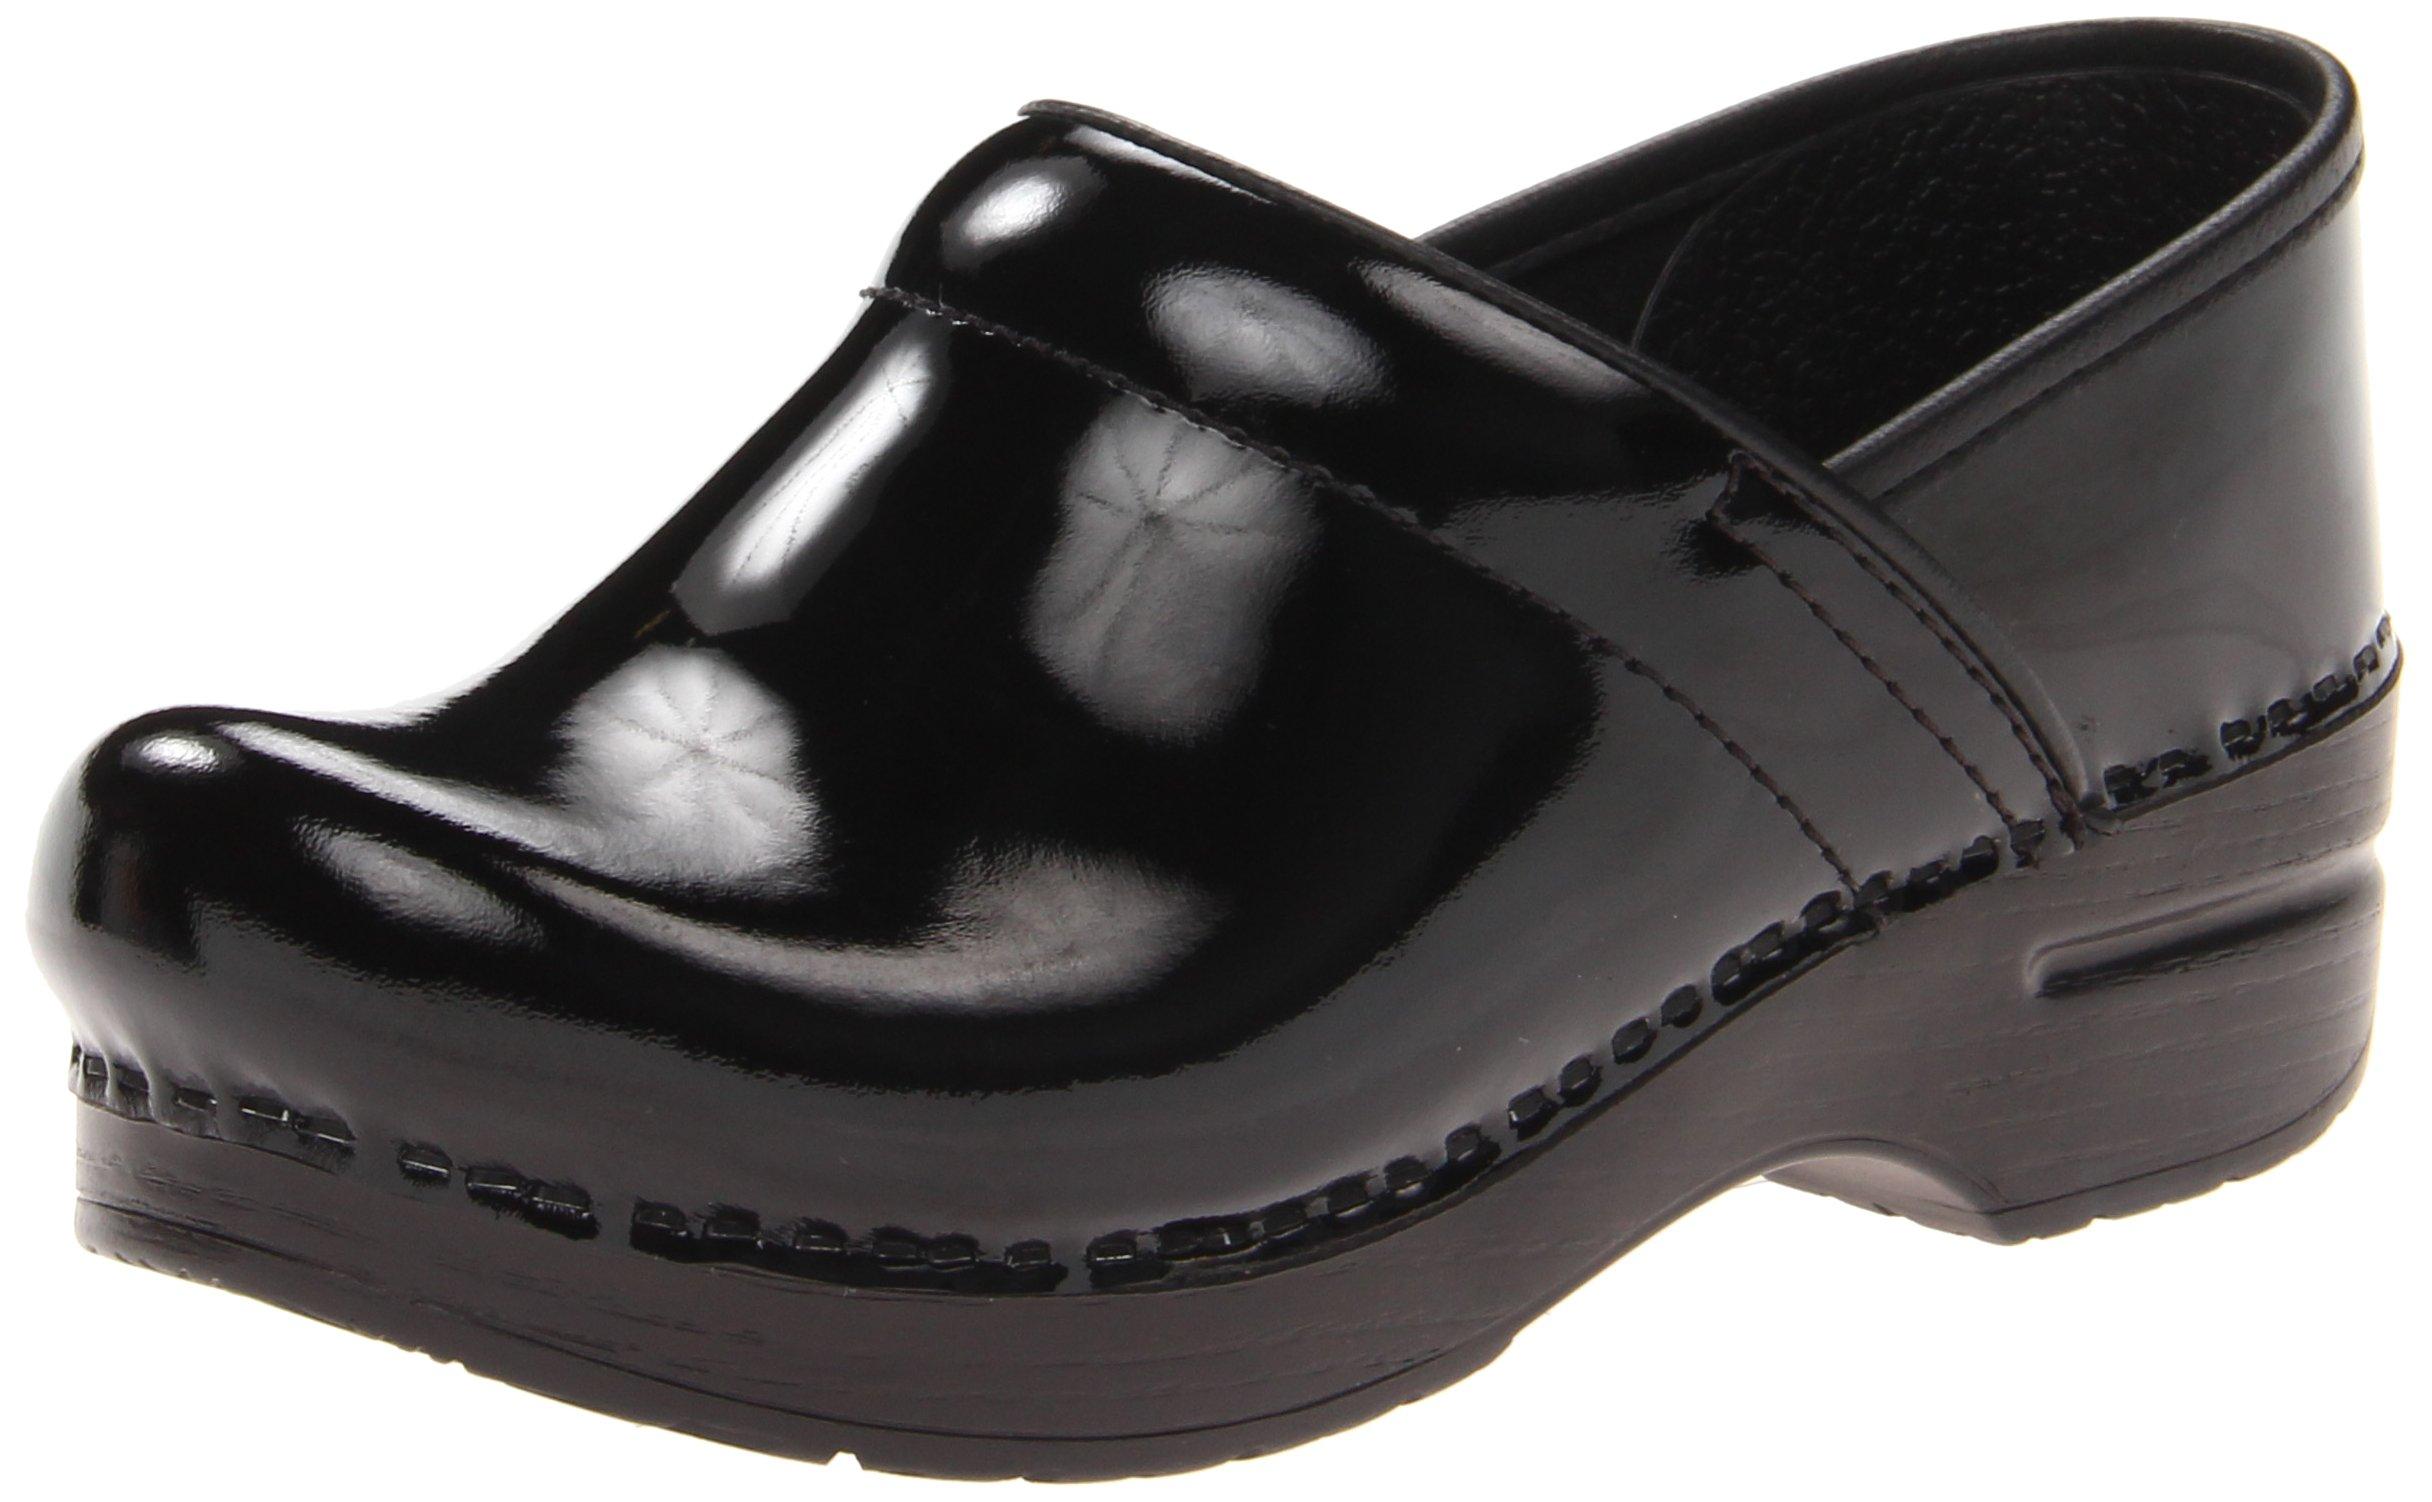 Dansko Women's Wide Pro Clog,Black Patent,37 EU/7 W US